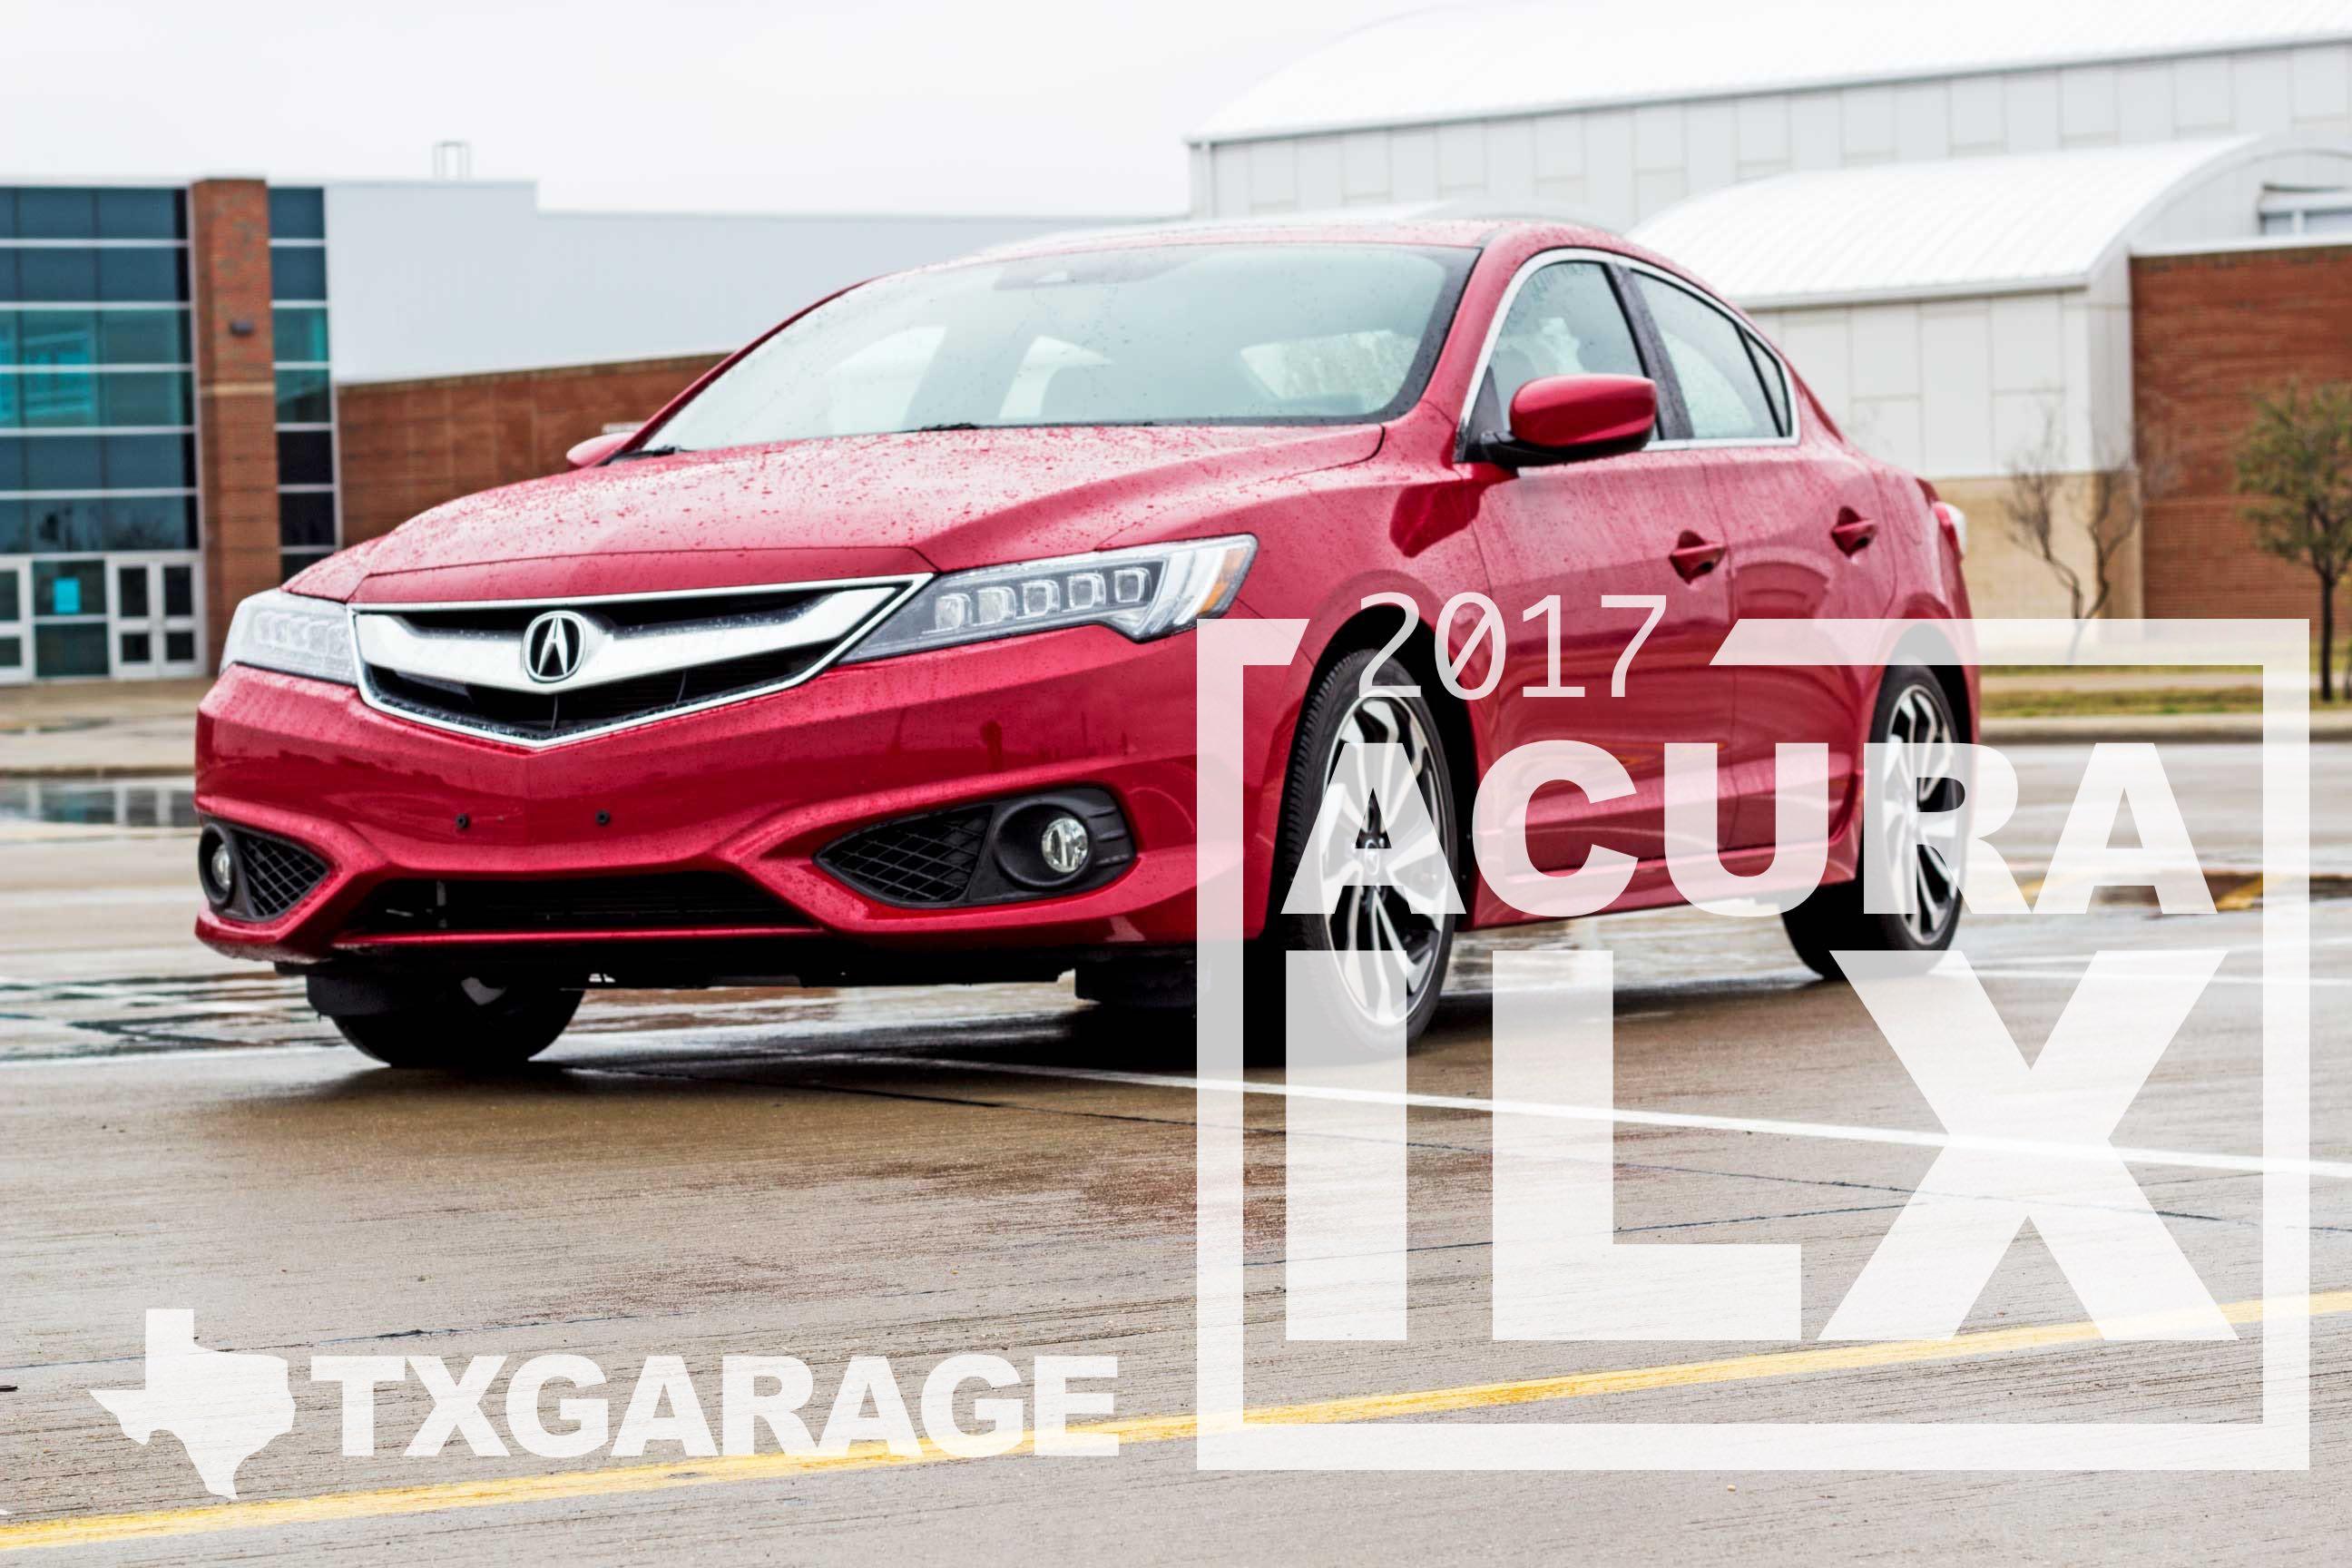 2017 Acura ILX cover